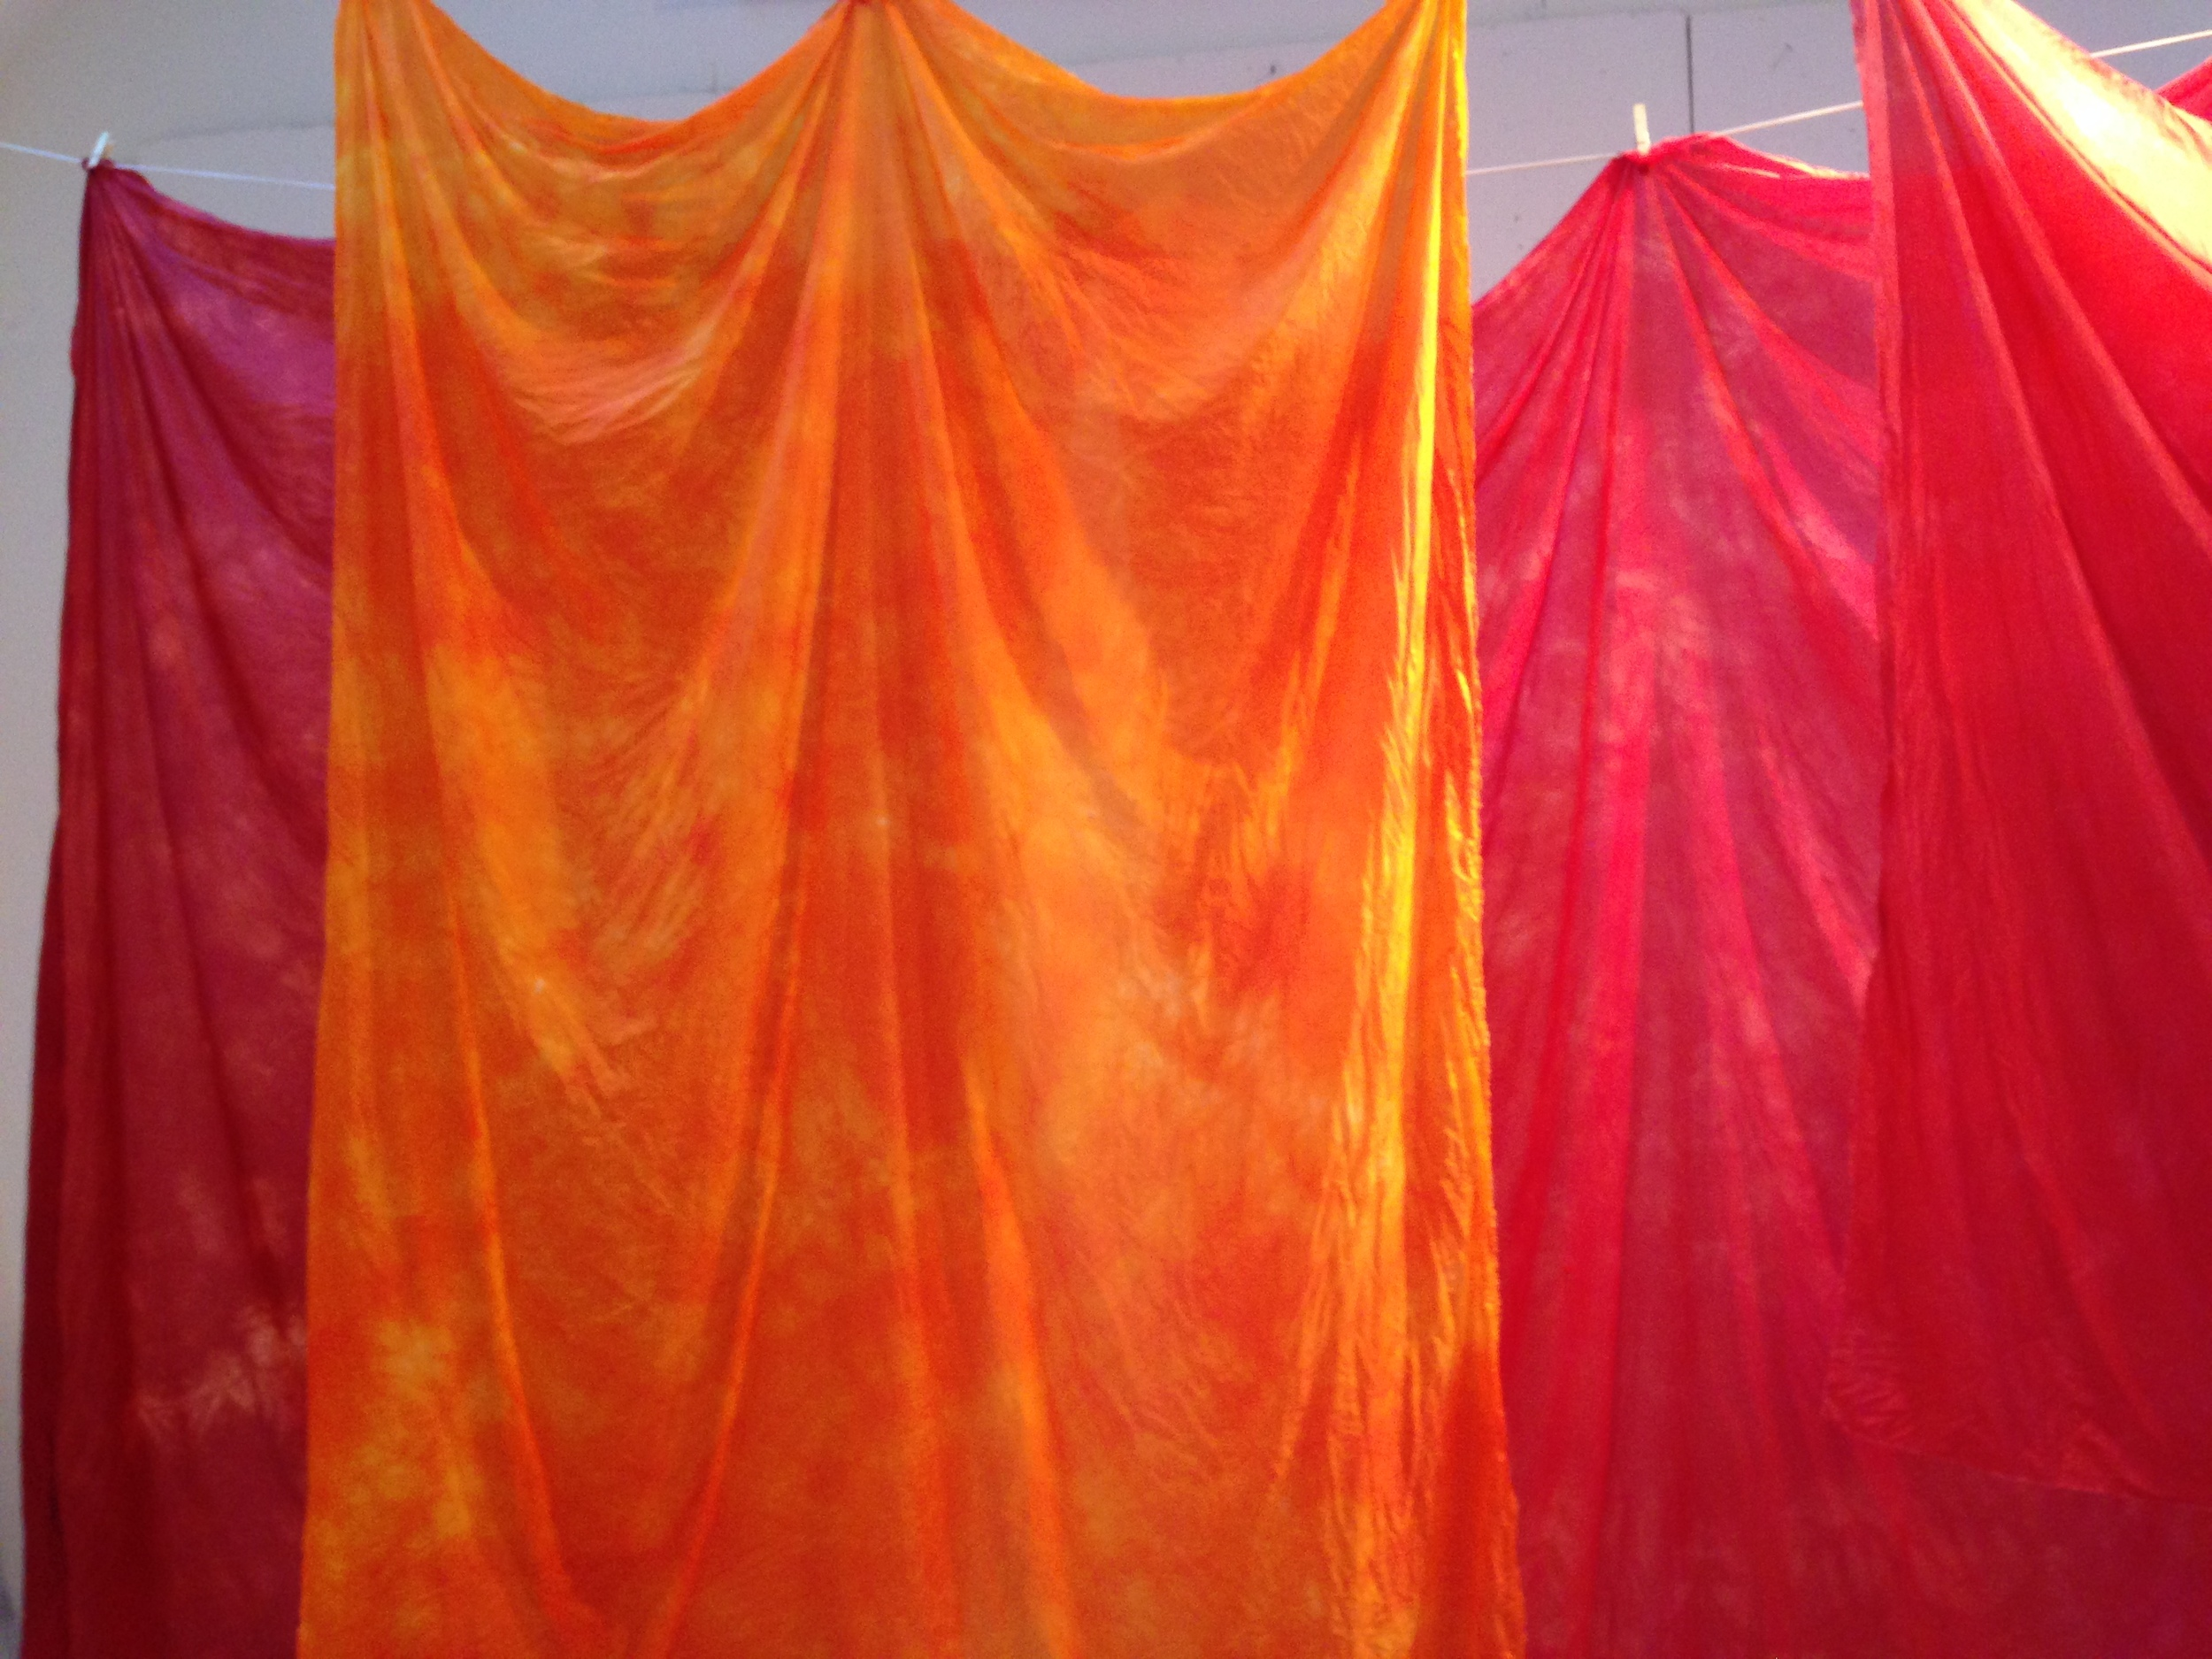 red silks drying.JPG